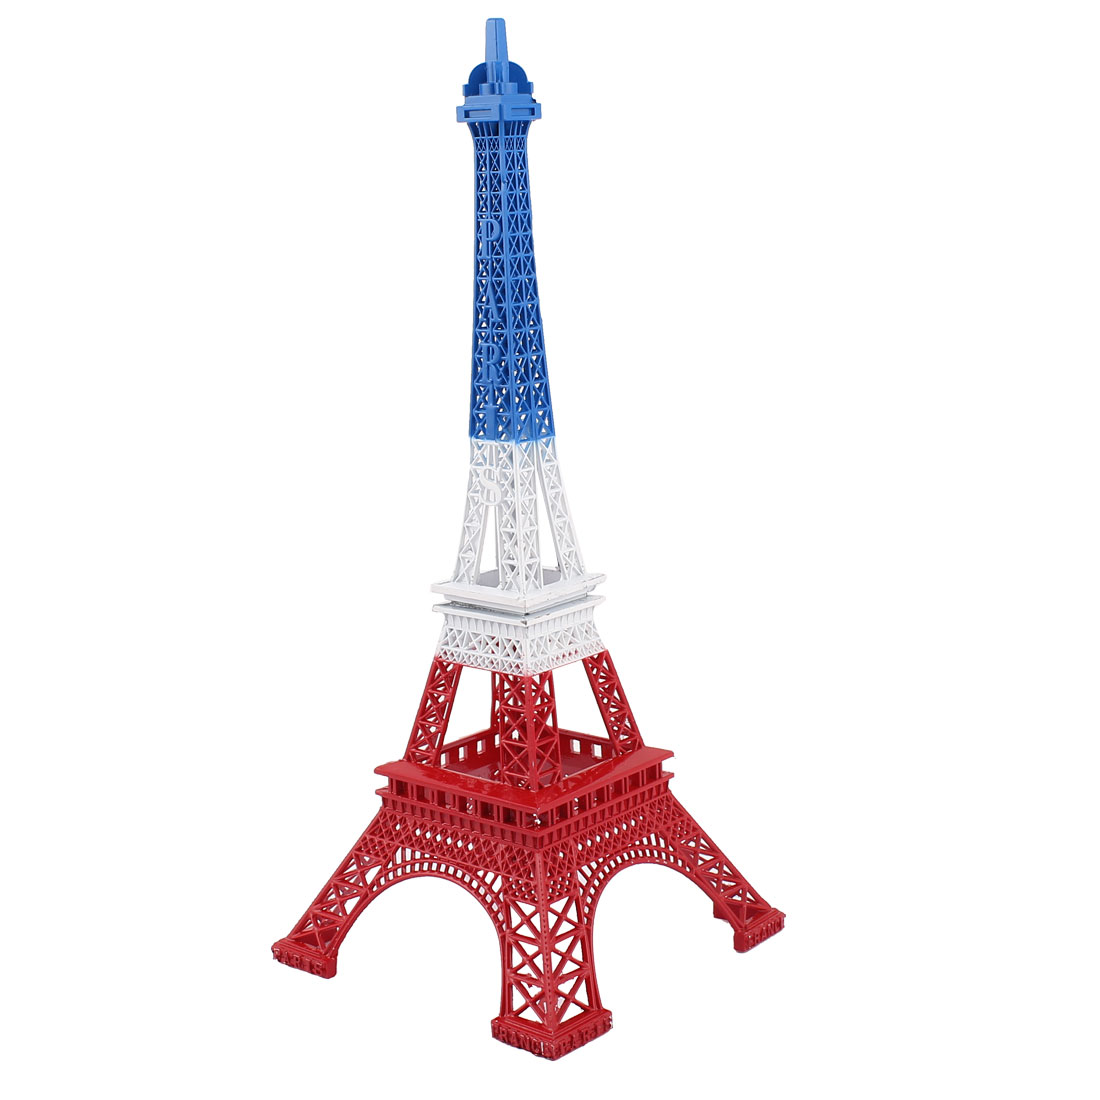 "Clear Rhinestone Inlaid Detachable Metal Mini France Paris Eiffel Tower Figurine Statue Model Ornament White Blue Red 38cm 15"""